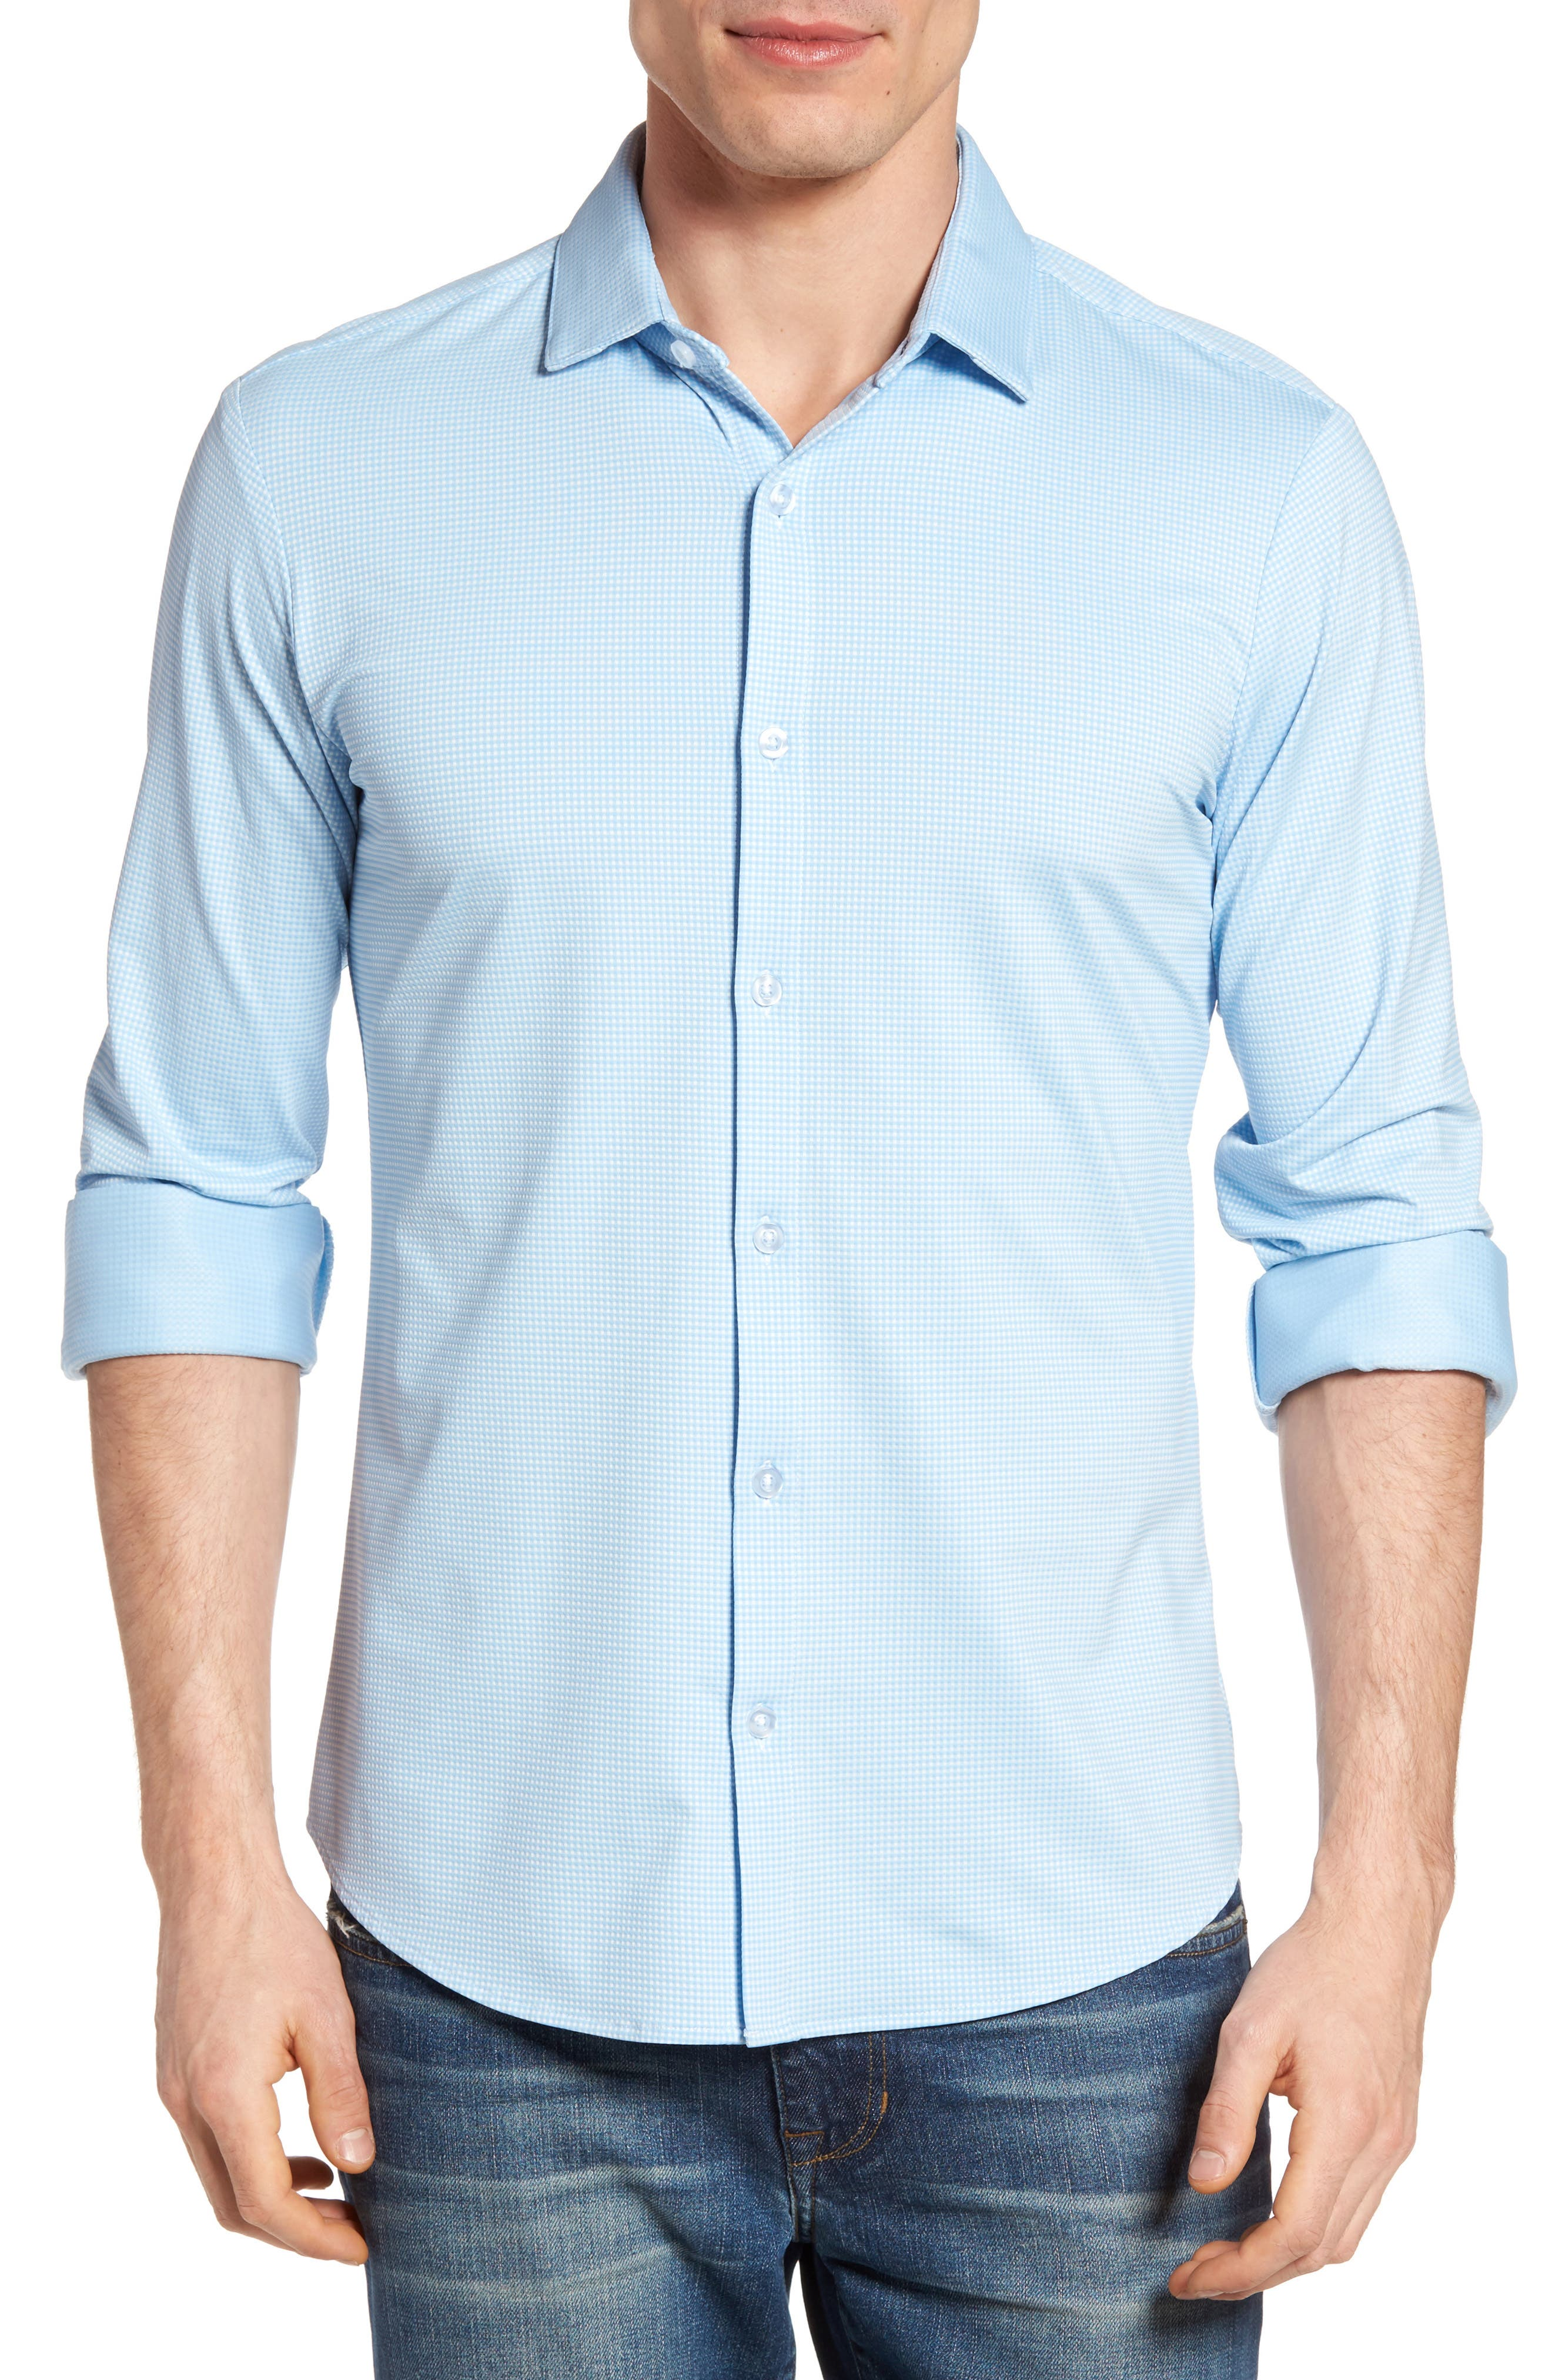 MIZZEN+MAIN, Whitman Trim Fit Dobby Gingham Performance Sport Shirt, Main thumbnail 1, color, BLUE